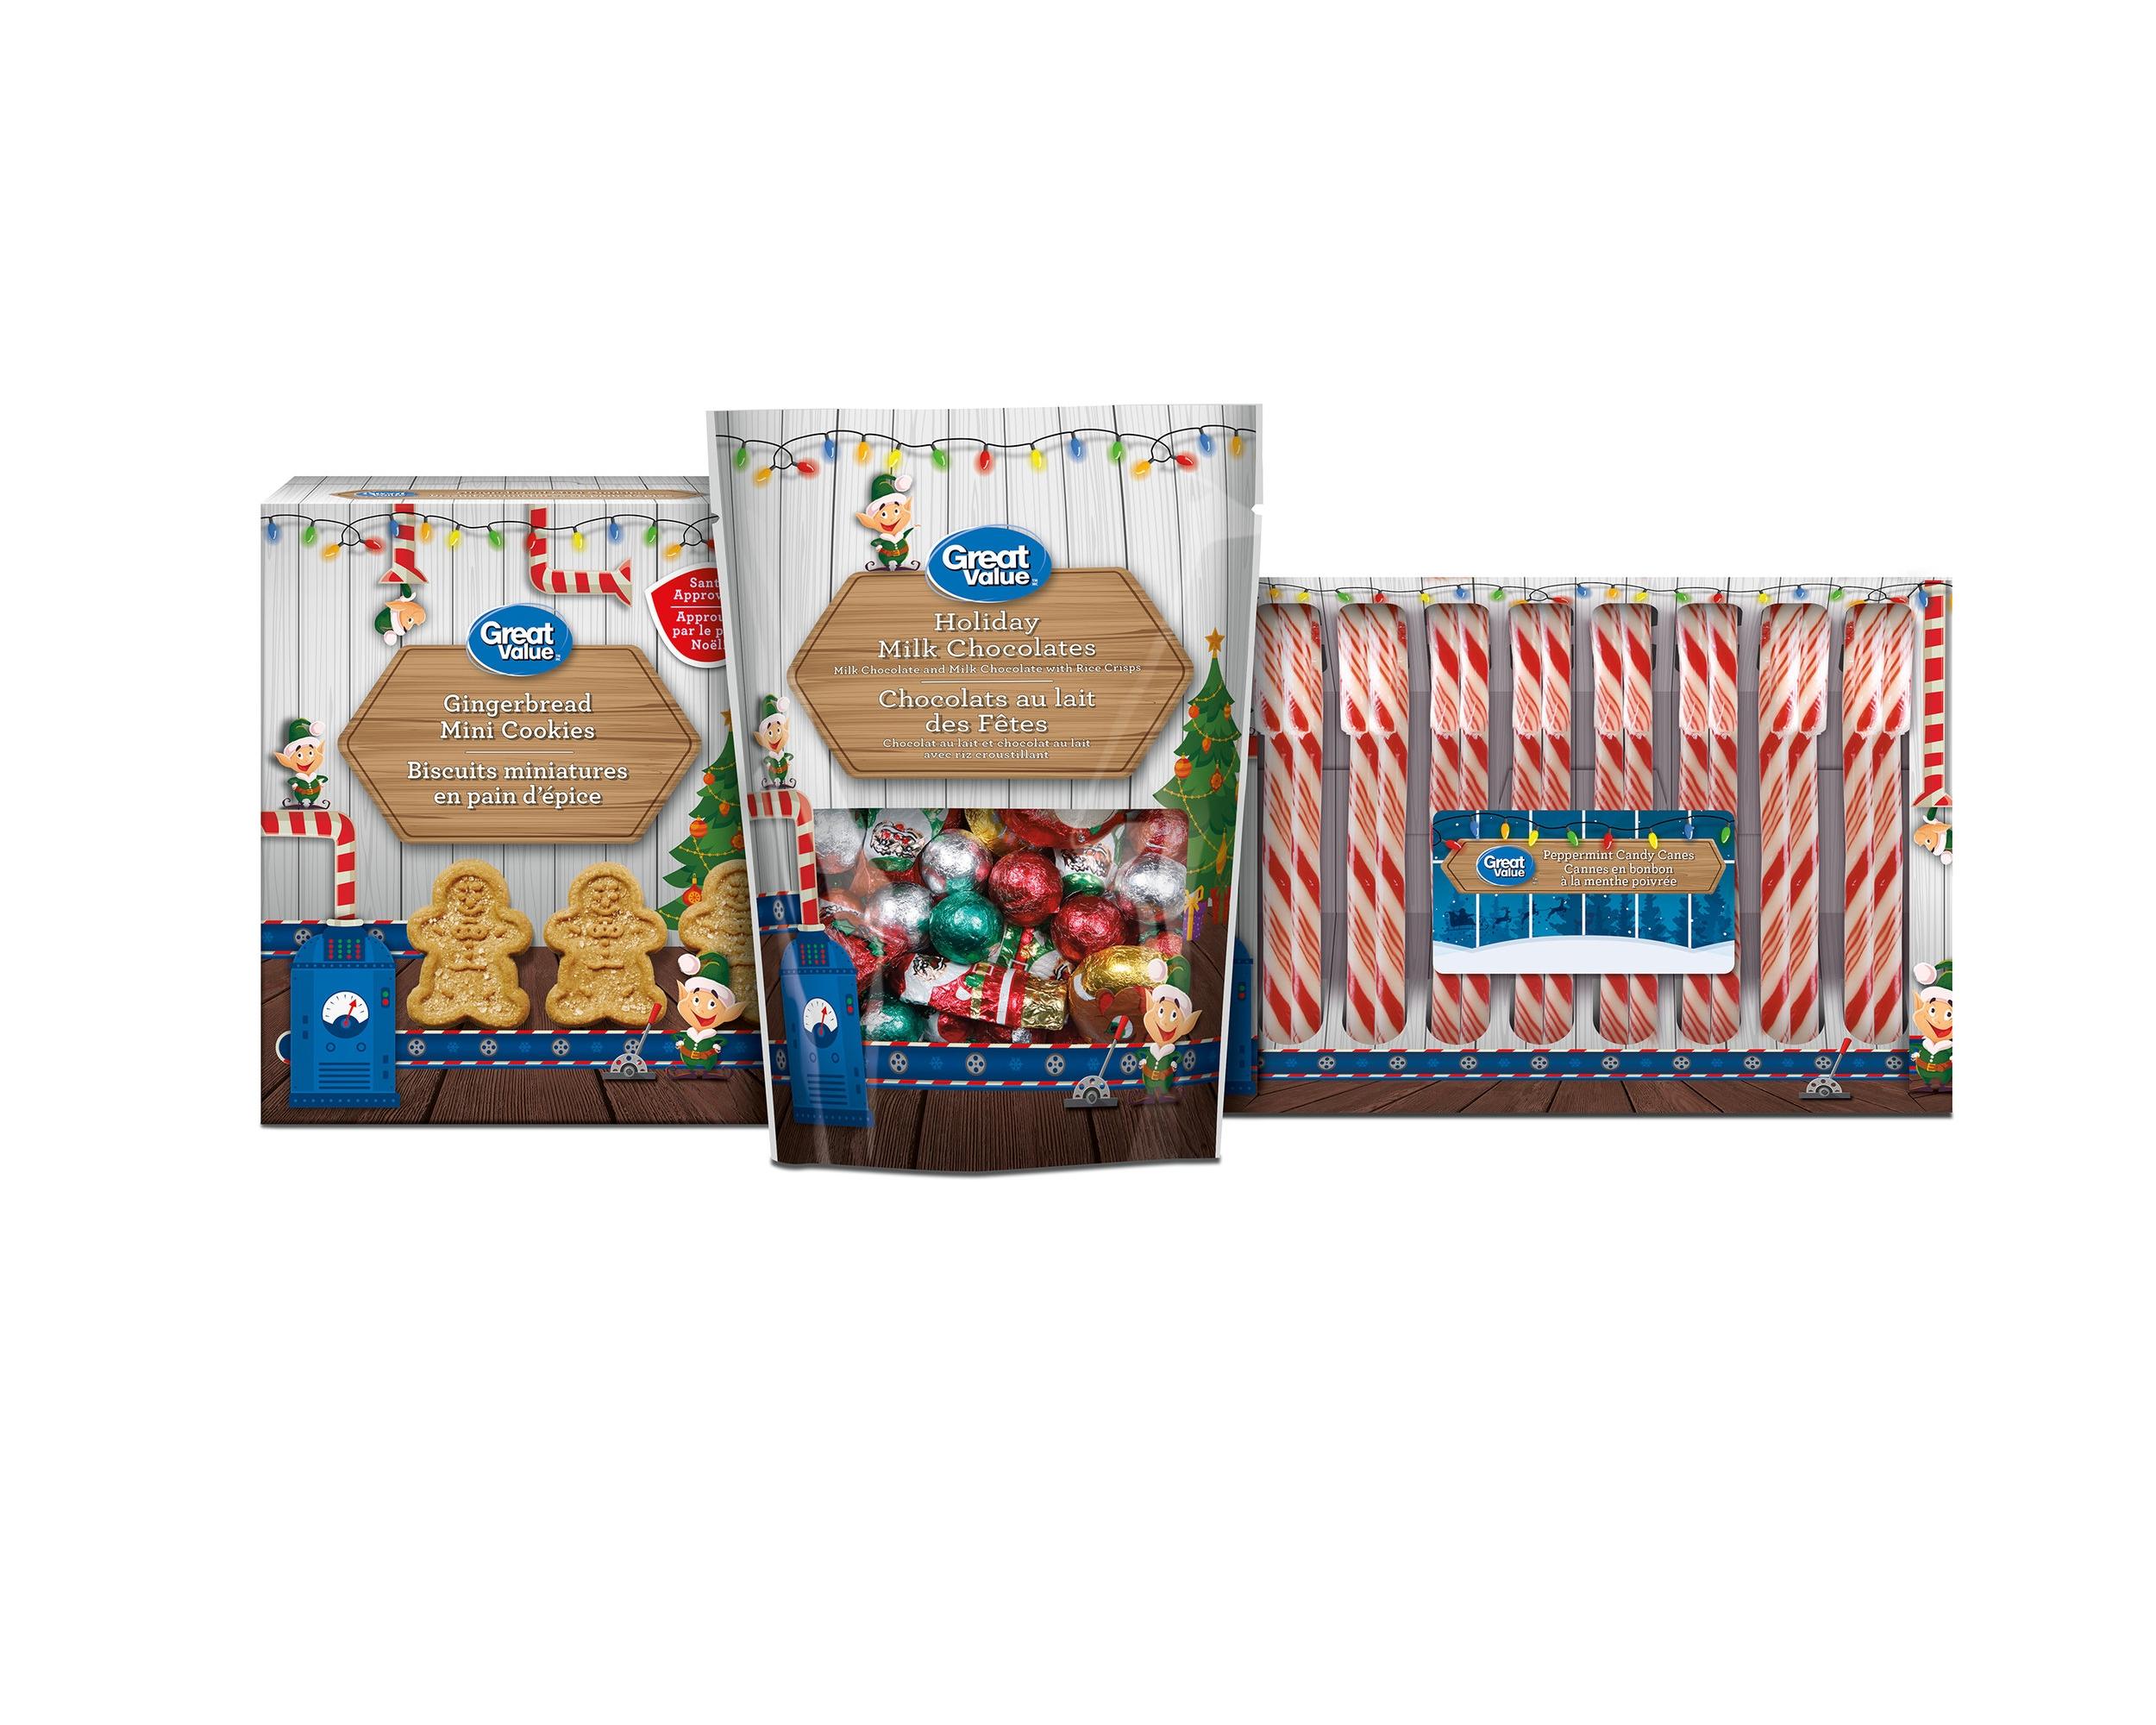 Walmart-GreatValue-Holiday-finalist